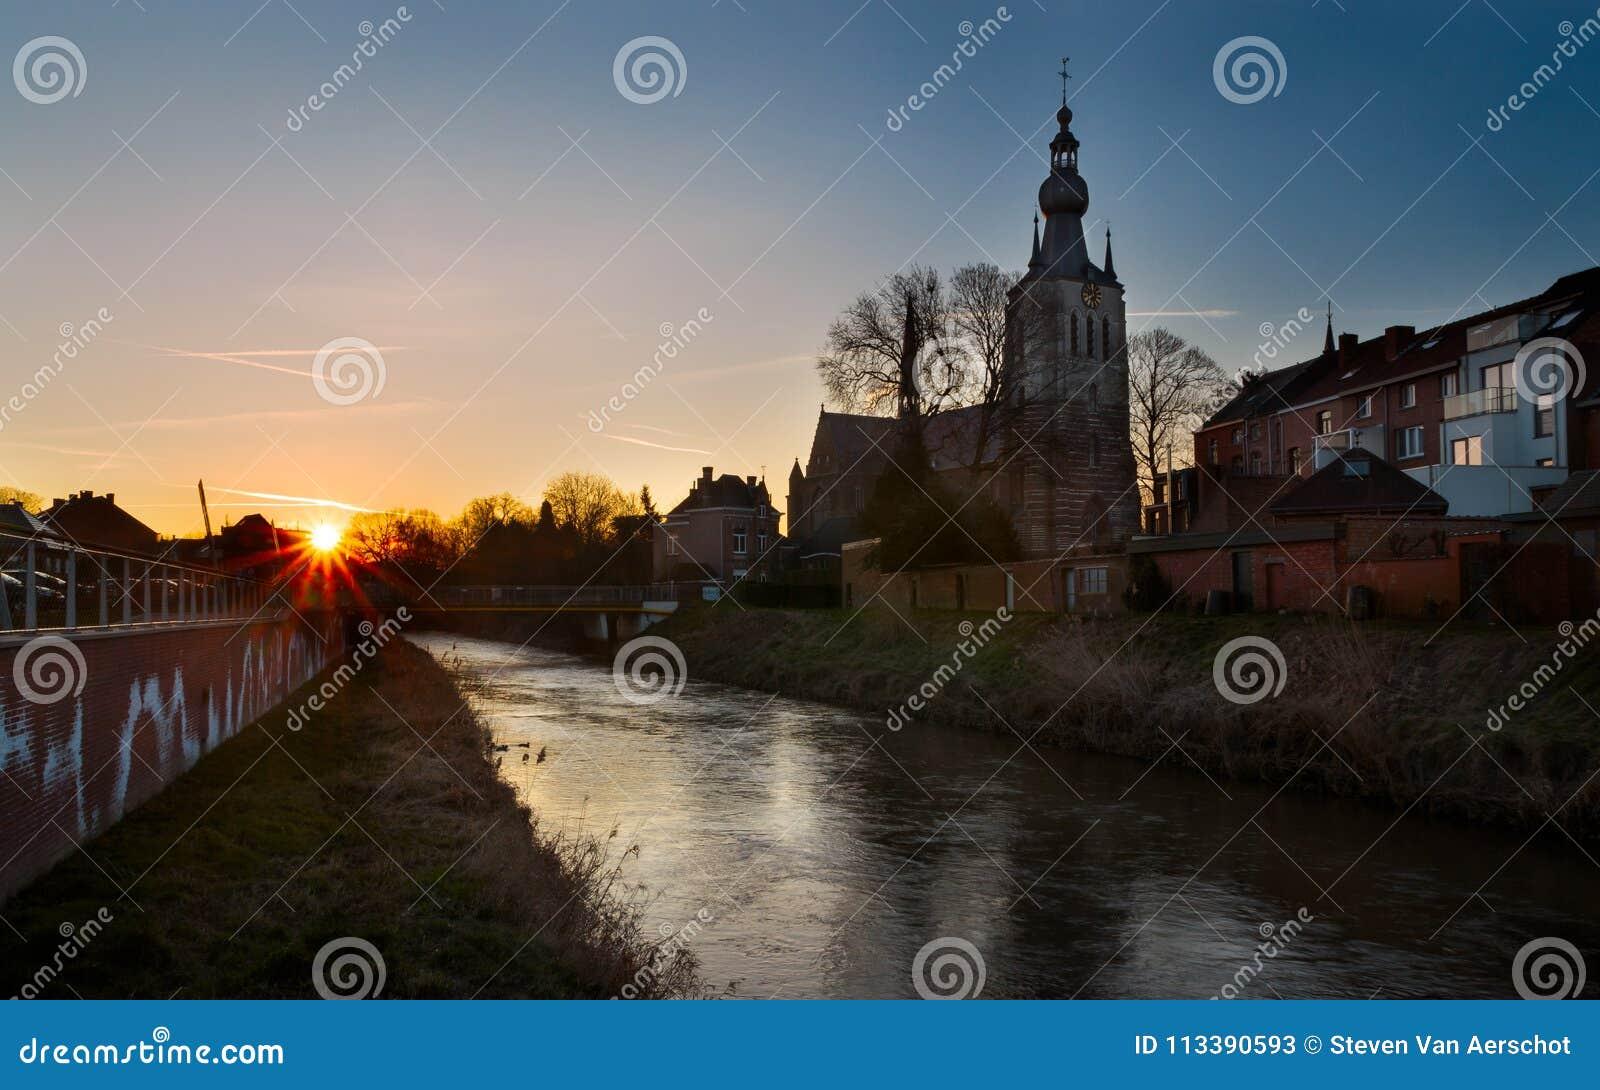 Aarschot gleich nach Sonnenaufgang, Belgien